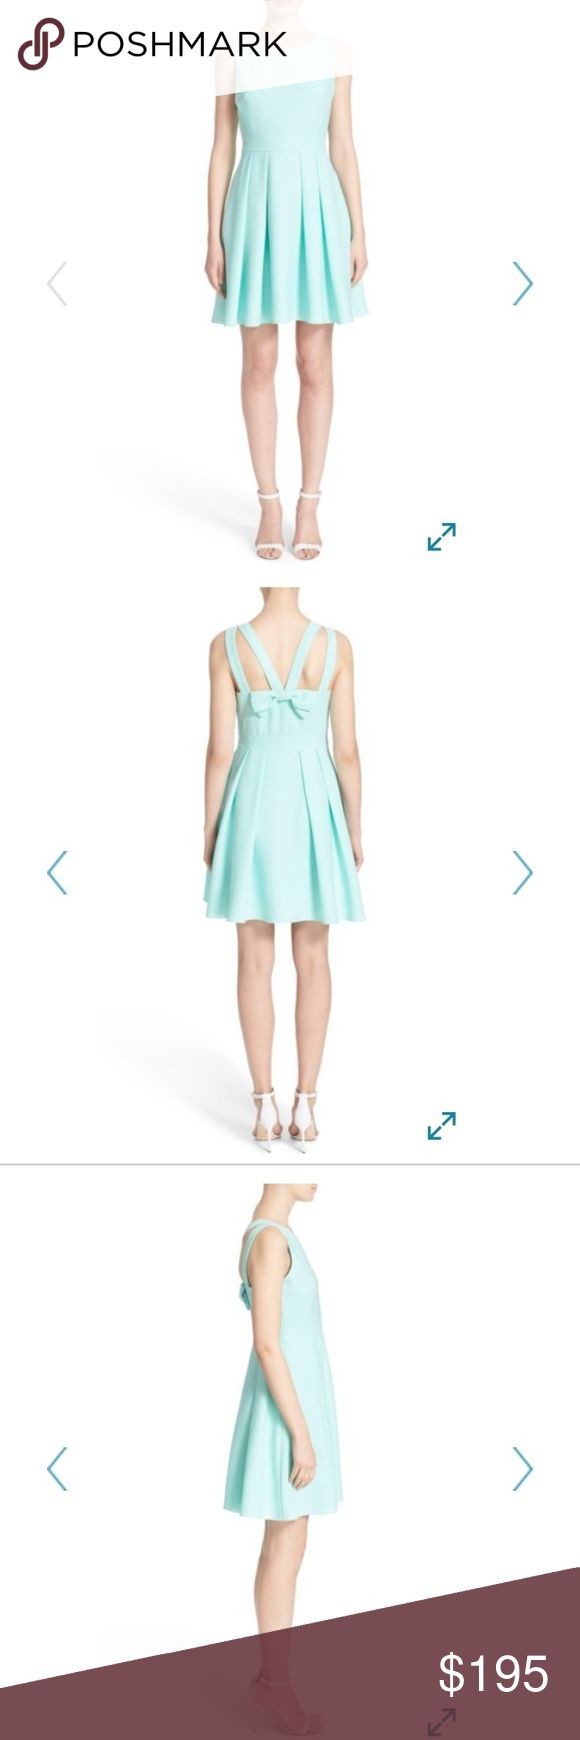 Kate Spade bow back crepe fit & flare dress NWT Kate Spade bow back crepe fit & flare dress NWT kate spade Dresses